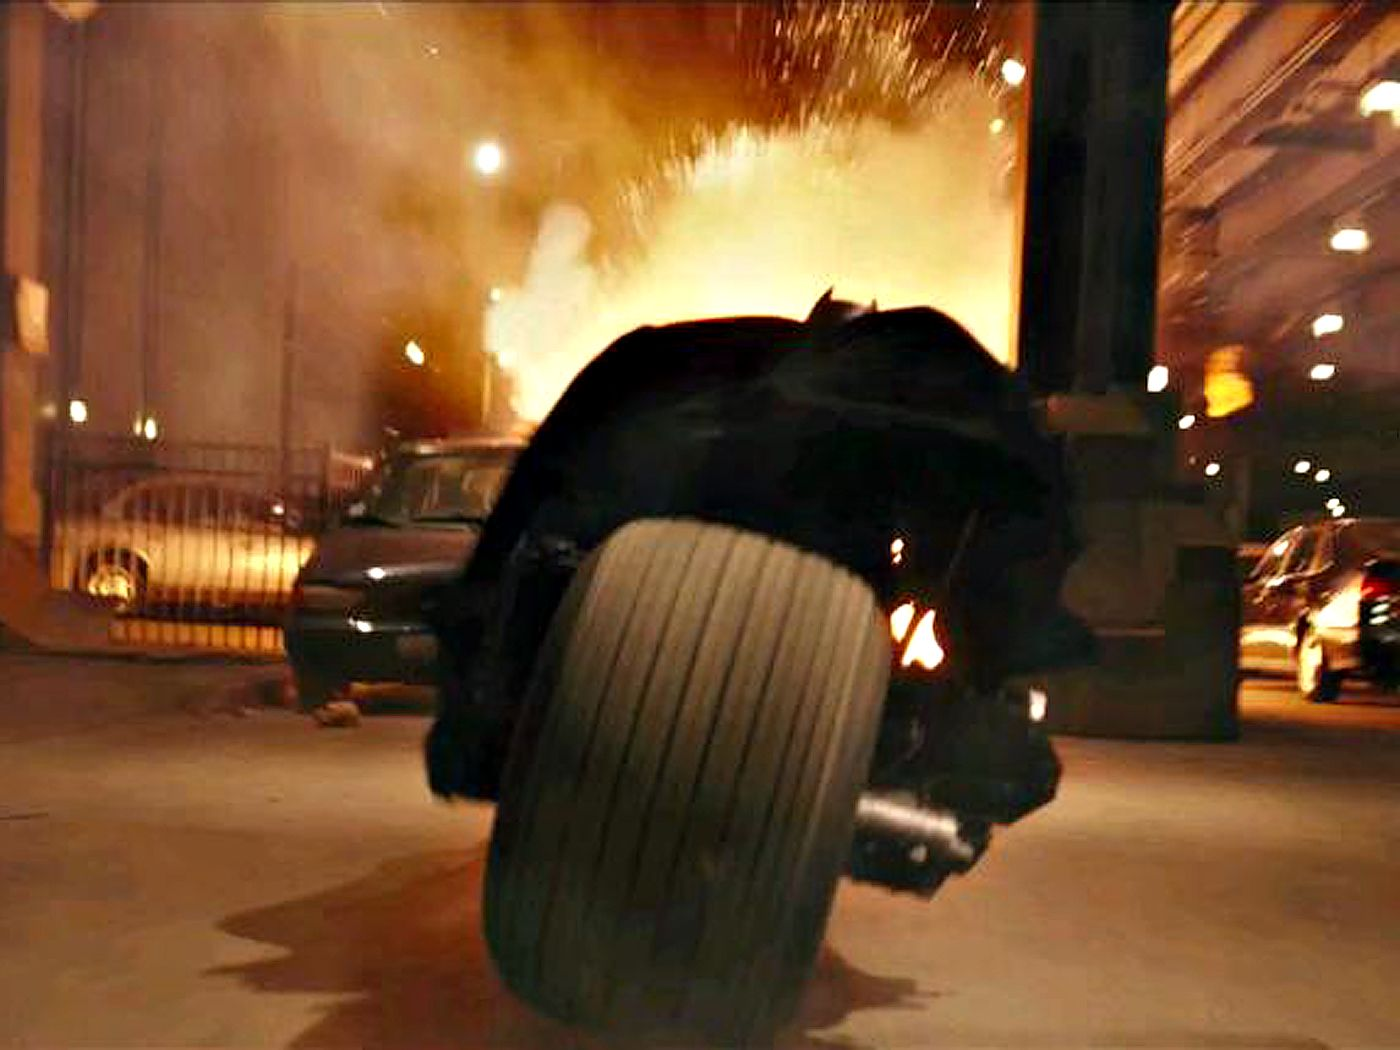 Batman On Motorcycle Blasting Cars Wallpaper 1400x1050